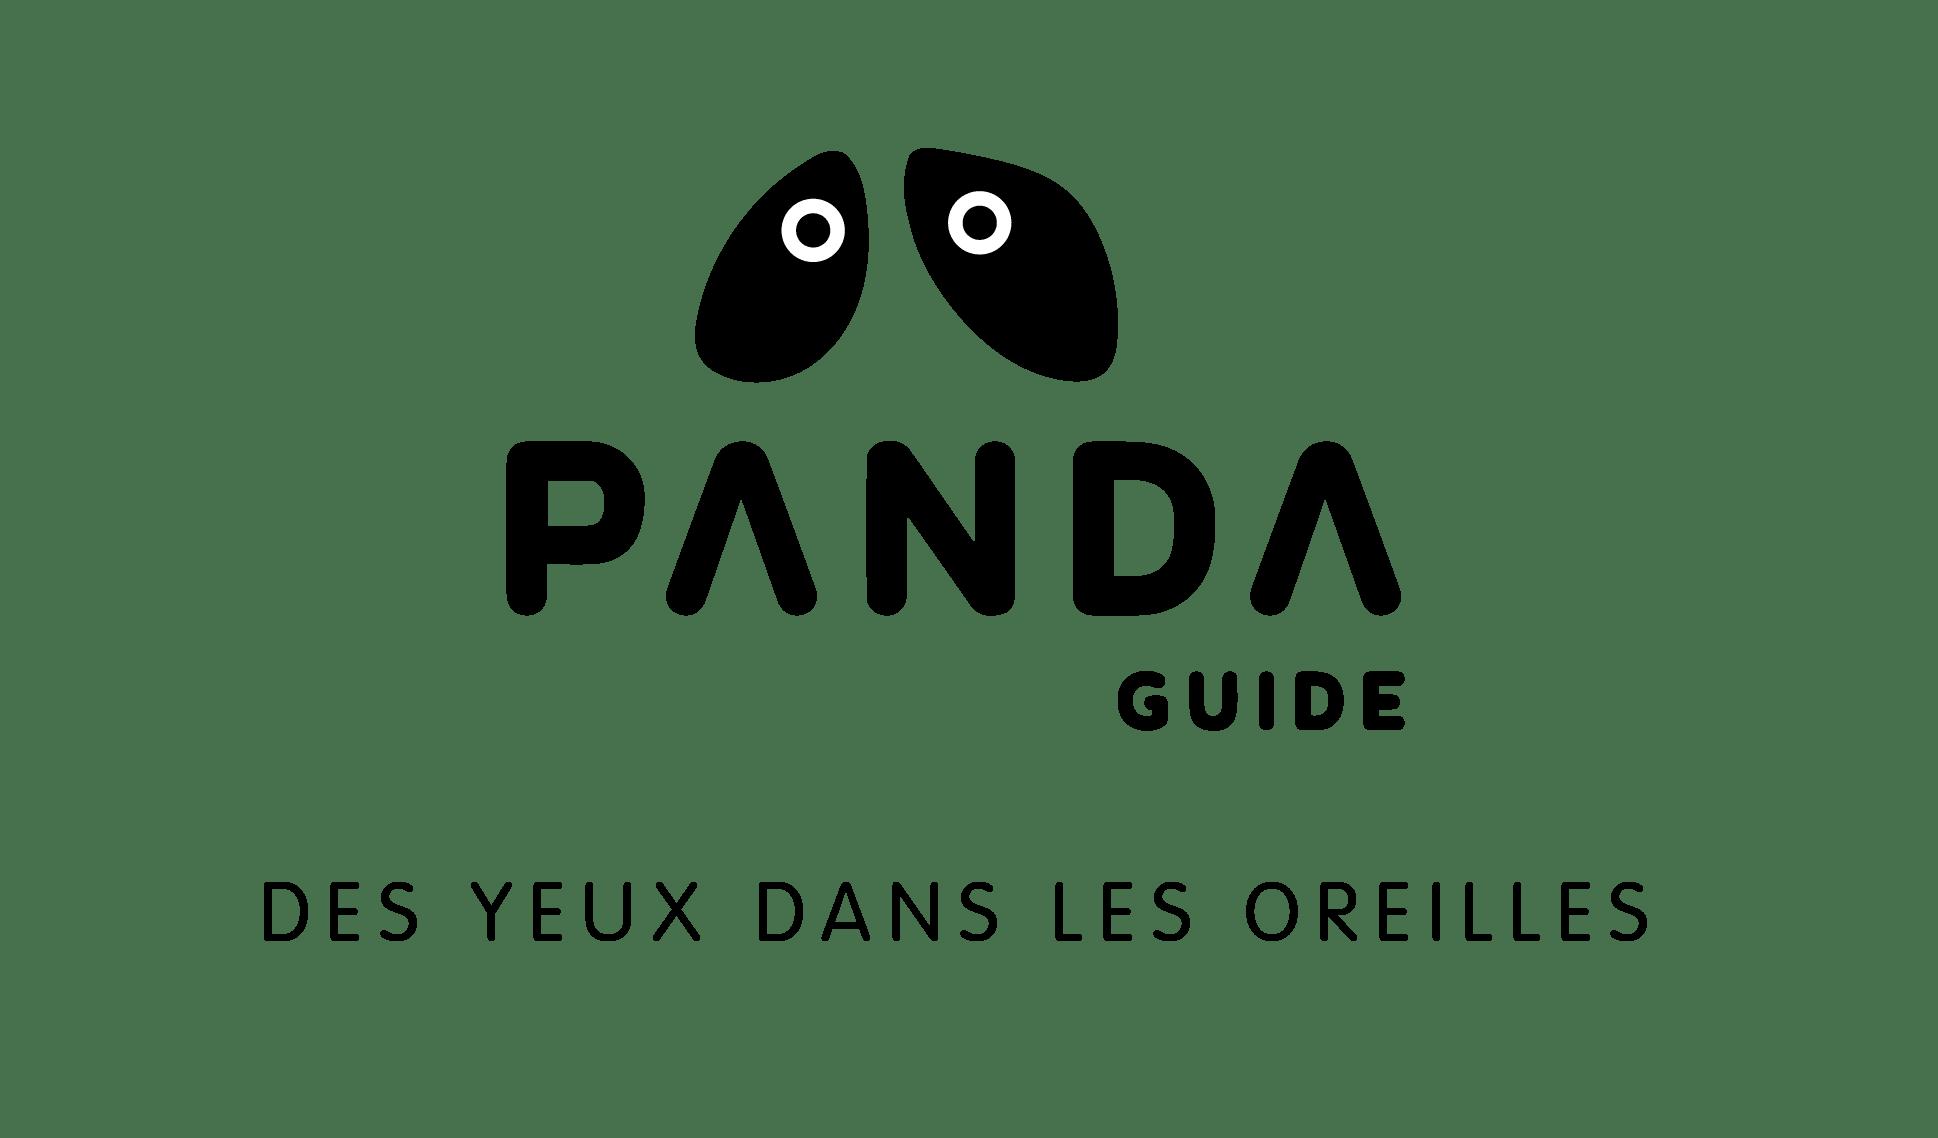 Panda-Guide aveugles